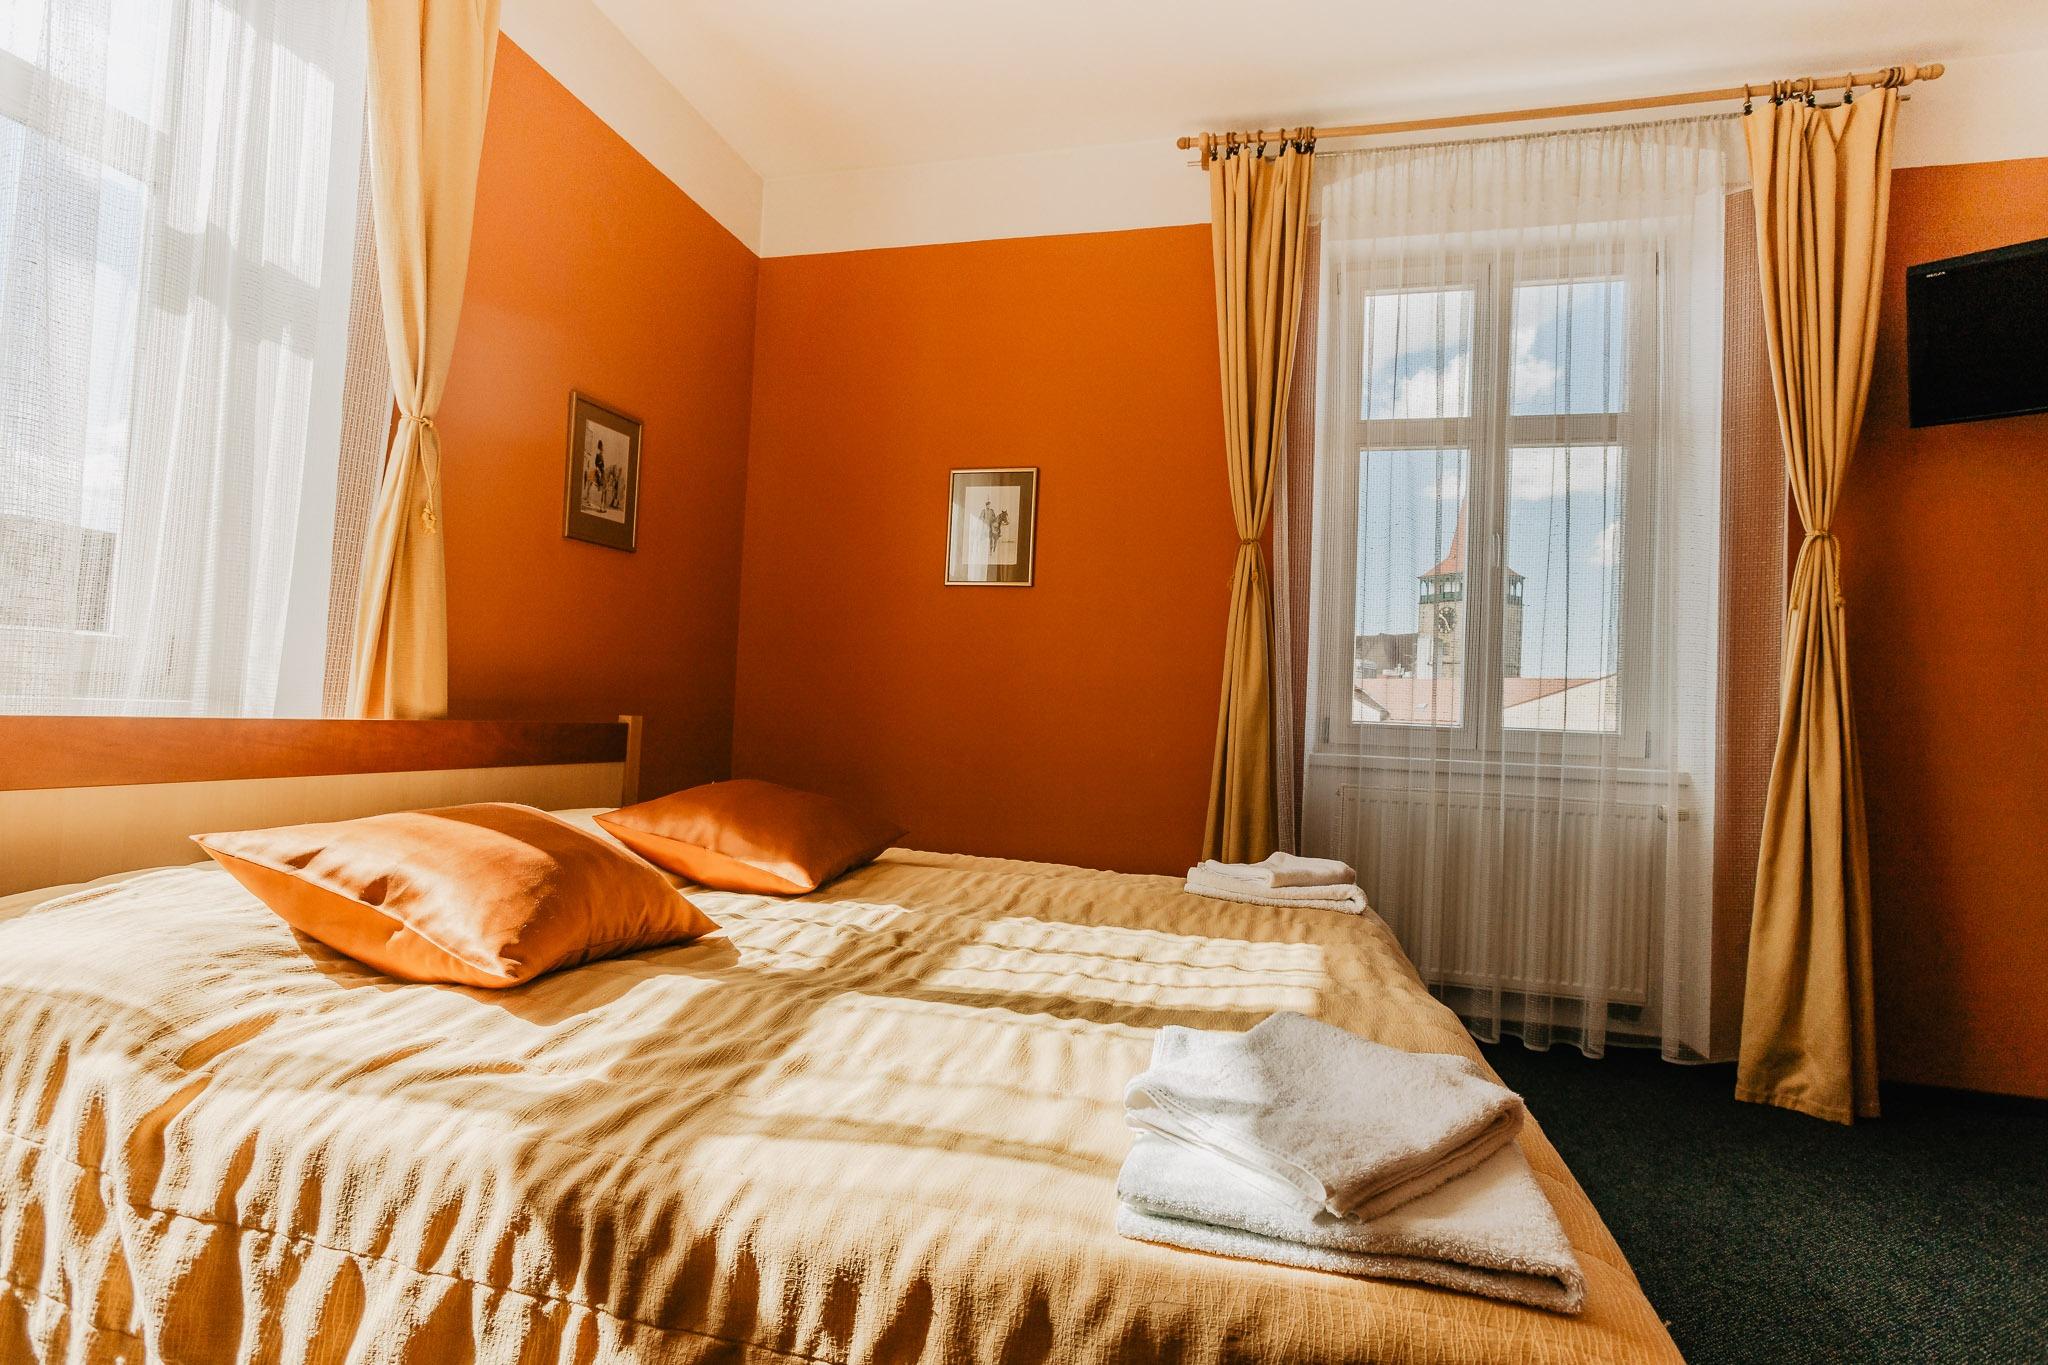 hotel u valdické brány jičín fotograf